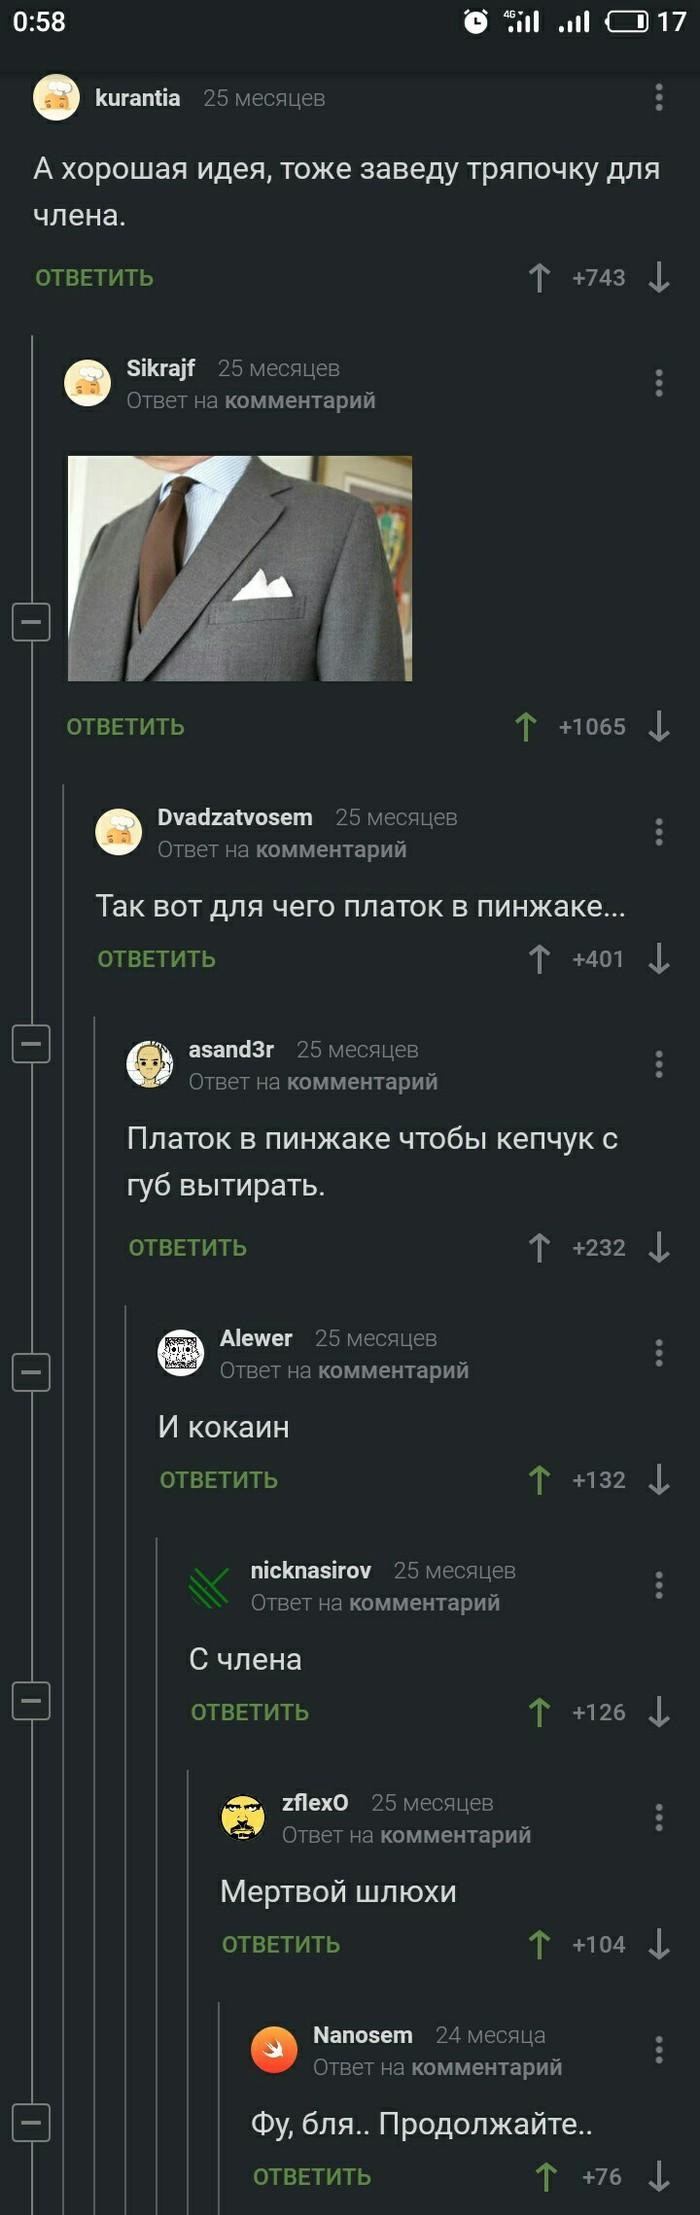 Тряпочка Комментарии, Скриншот, Длиннопост